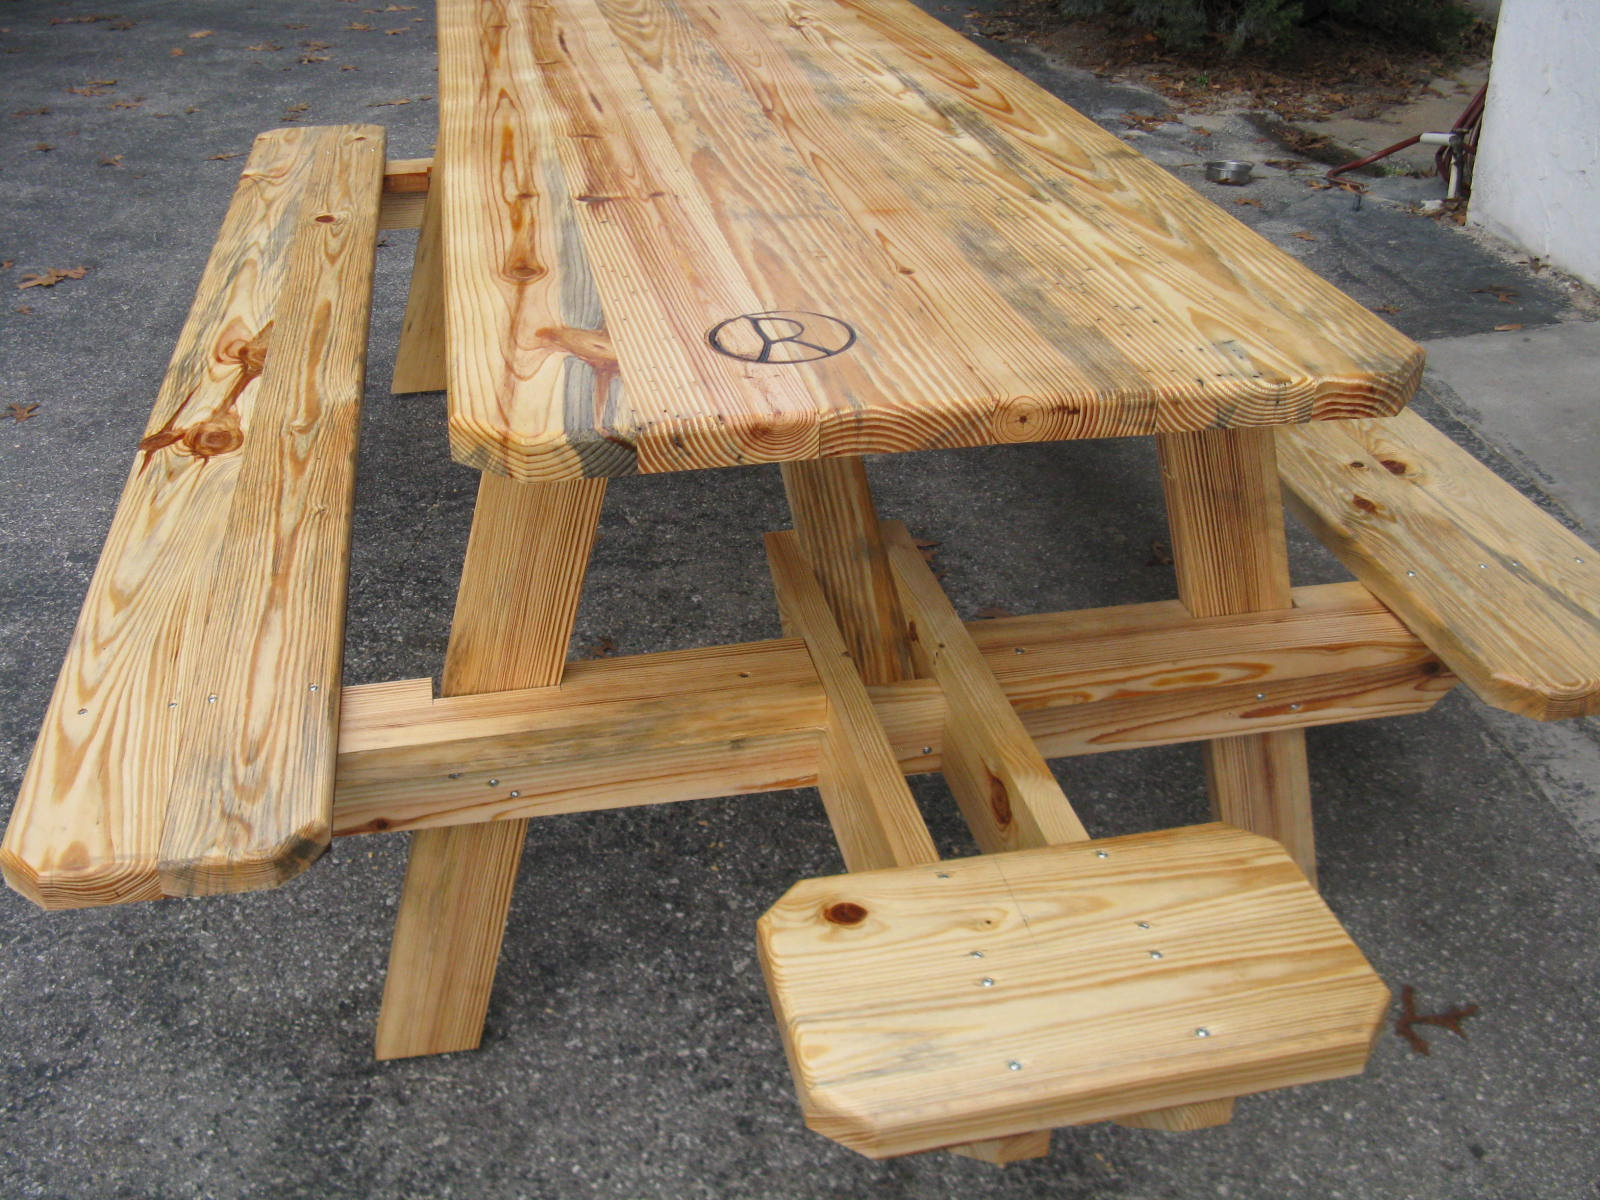 Ocala Hardwoods Amp Sawmill By Robert Ross Of Wood Crafting